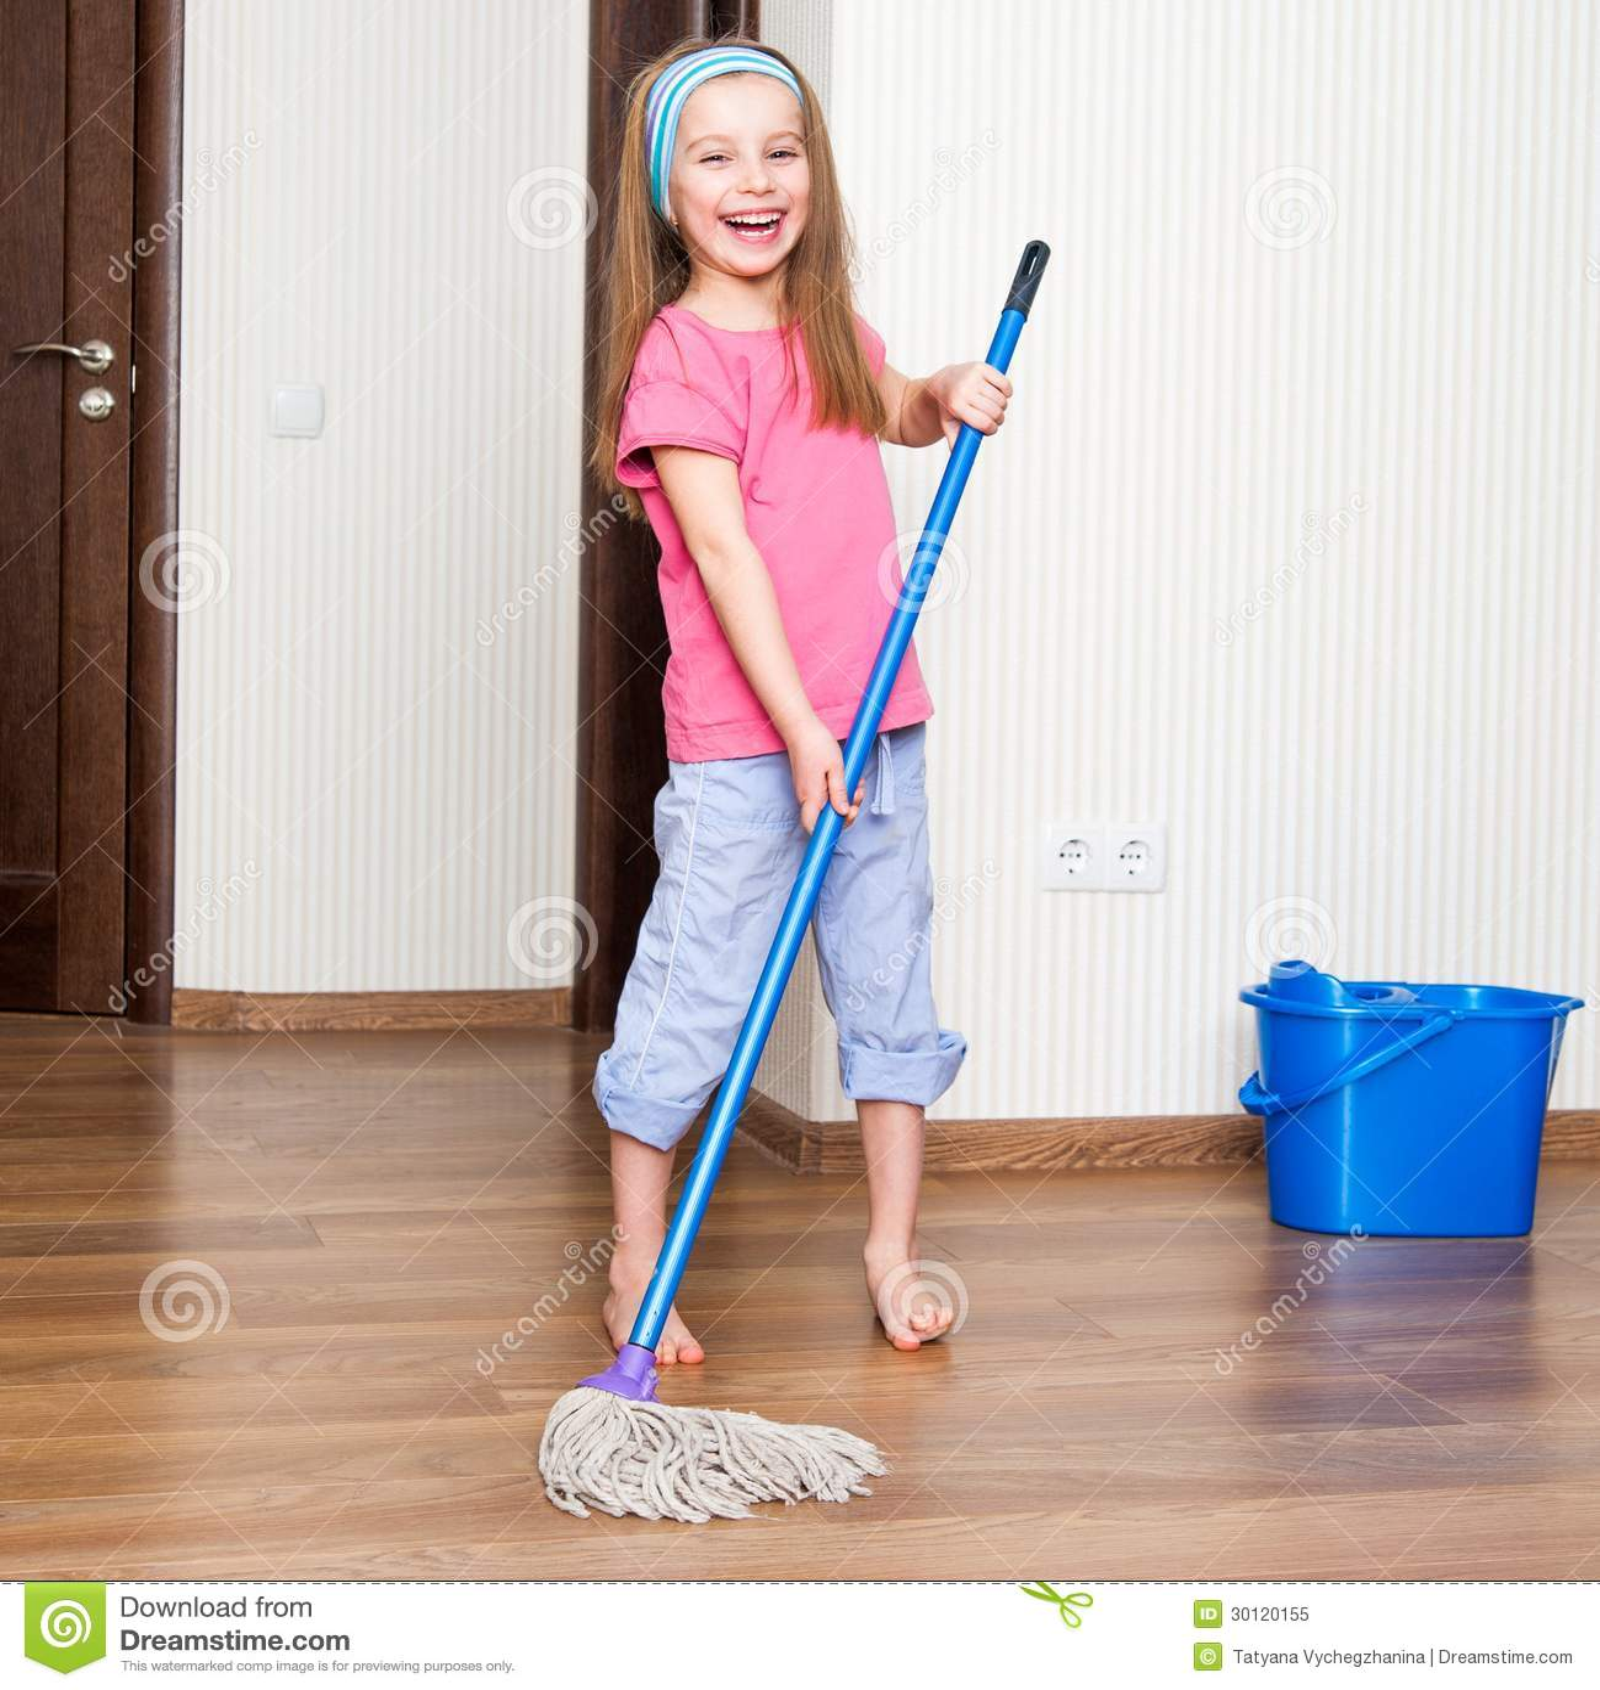 Computer Room Floor Plan Little Girl Washing The Floor Royalty Free Stock Photo